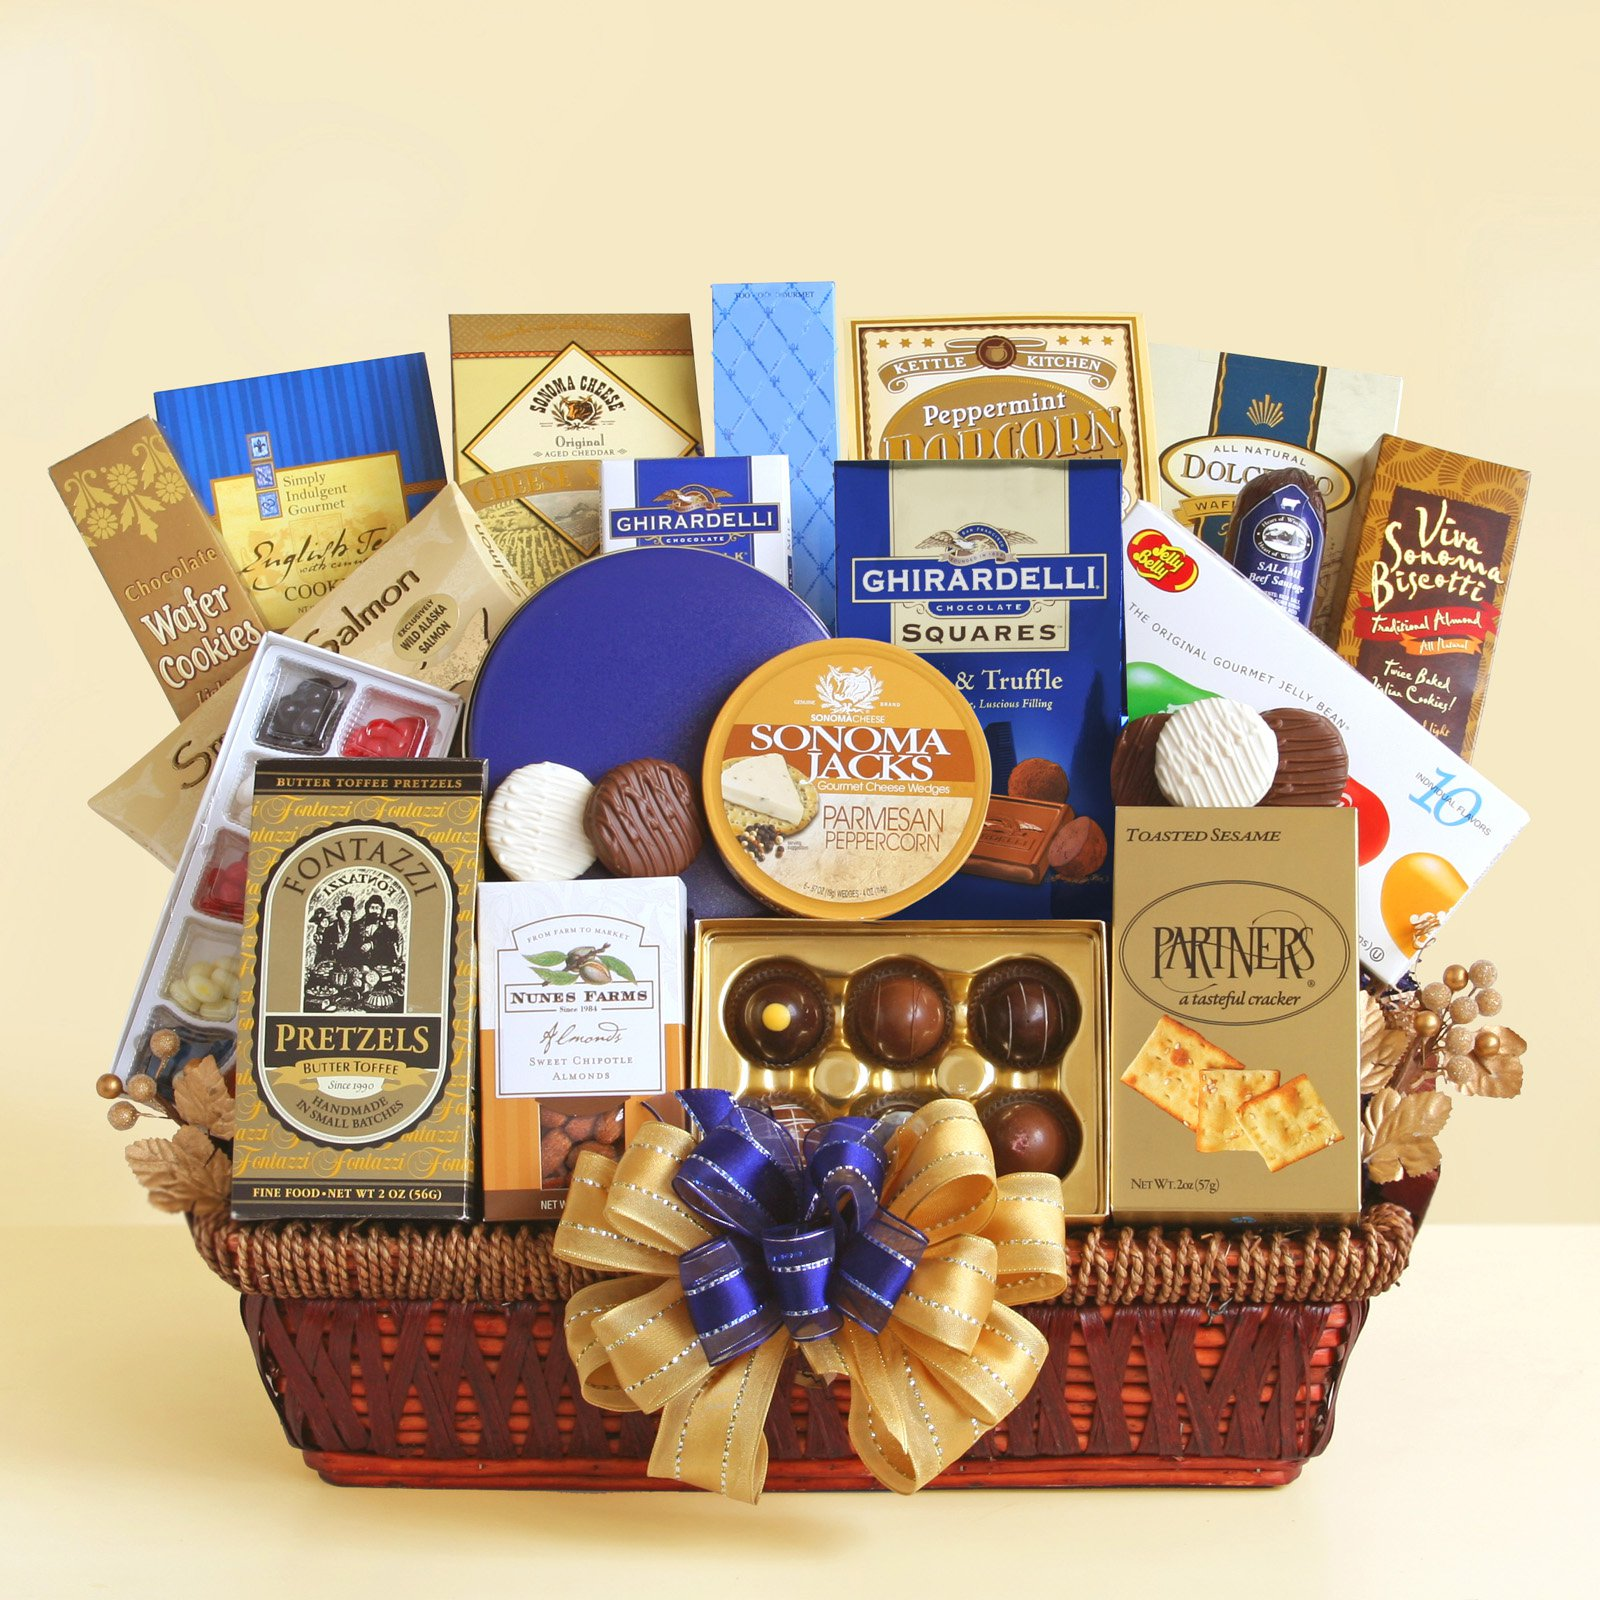 Executive Decision Gift Basket